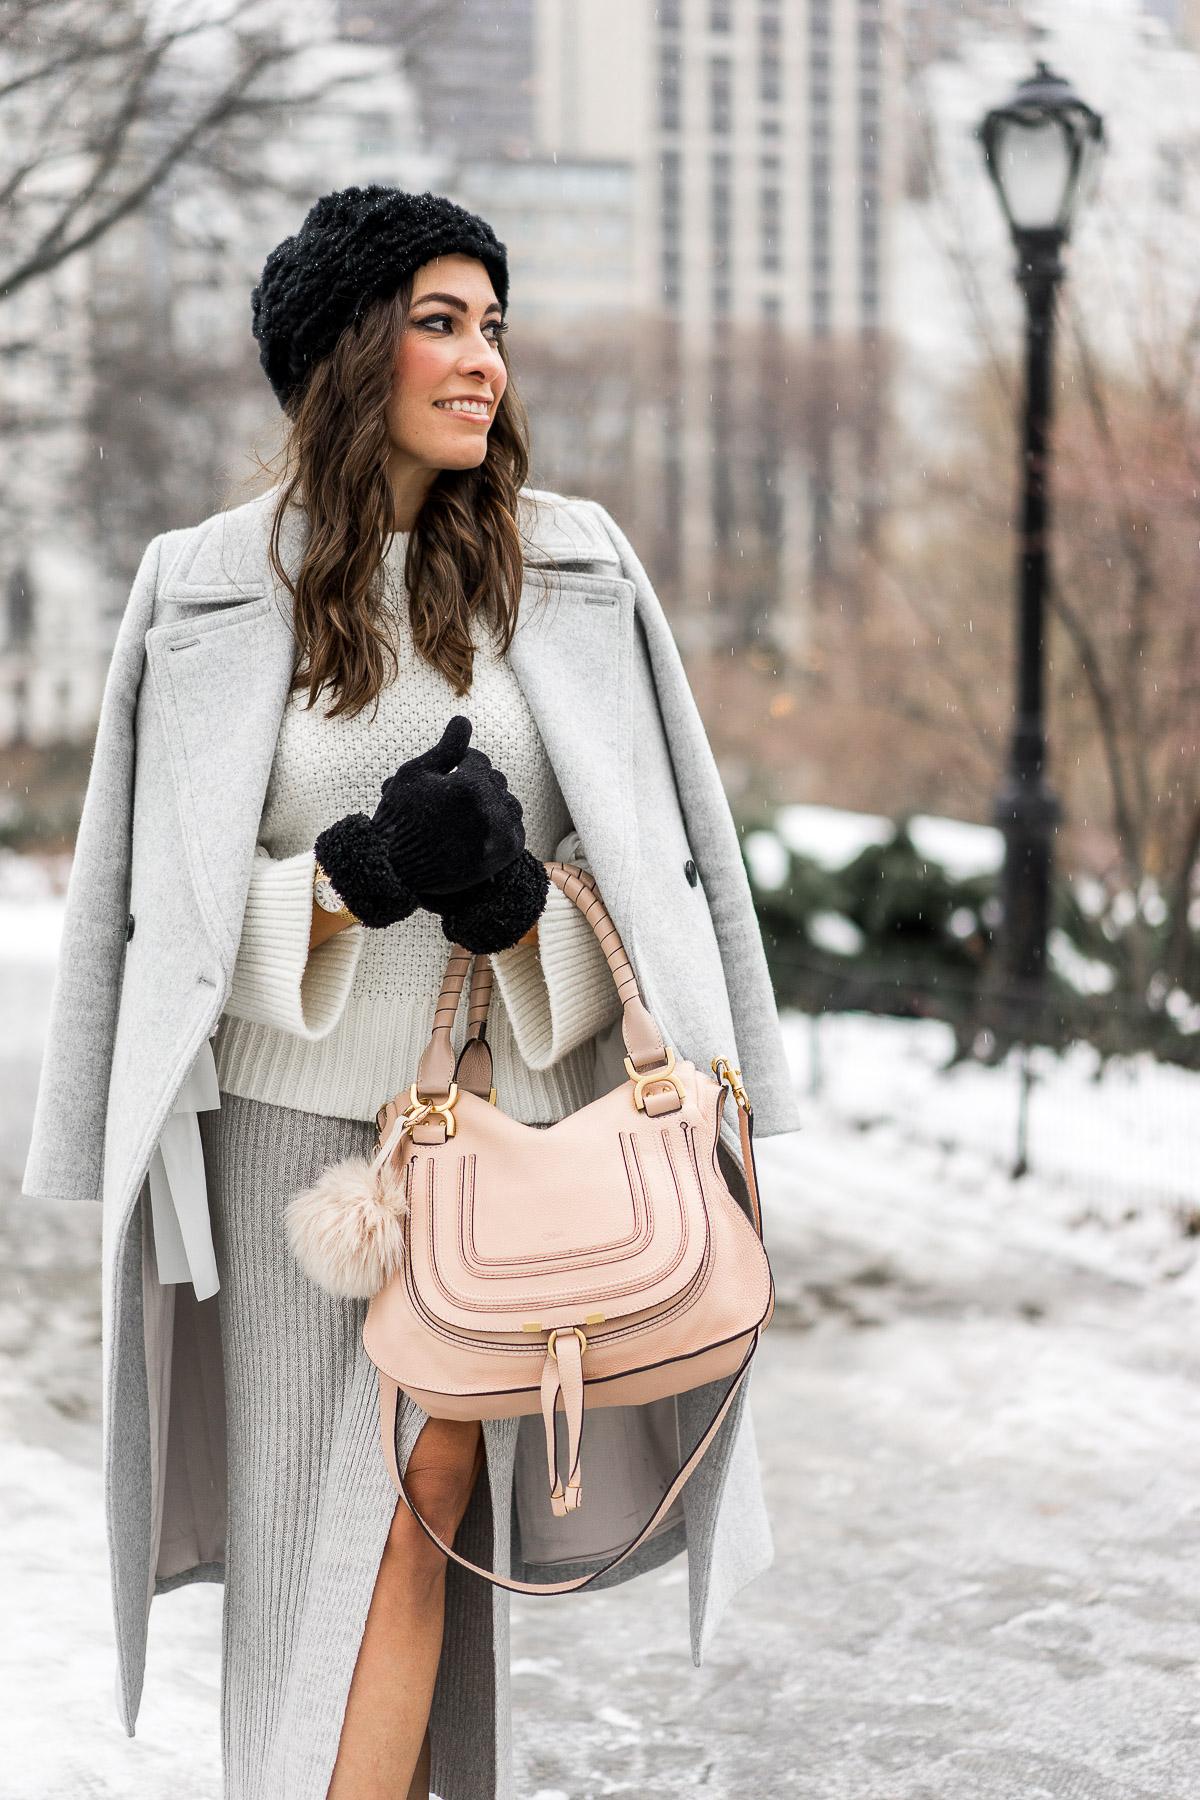 BCBGeneration grey midi skirt worn by fashion blogger Amanda of A Glam Lifestyle during NYFW with Chloe Marcie bag and Club Monaco Daylina coat and sweater